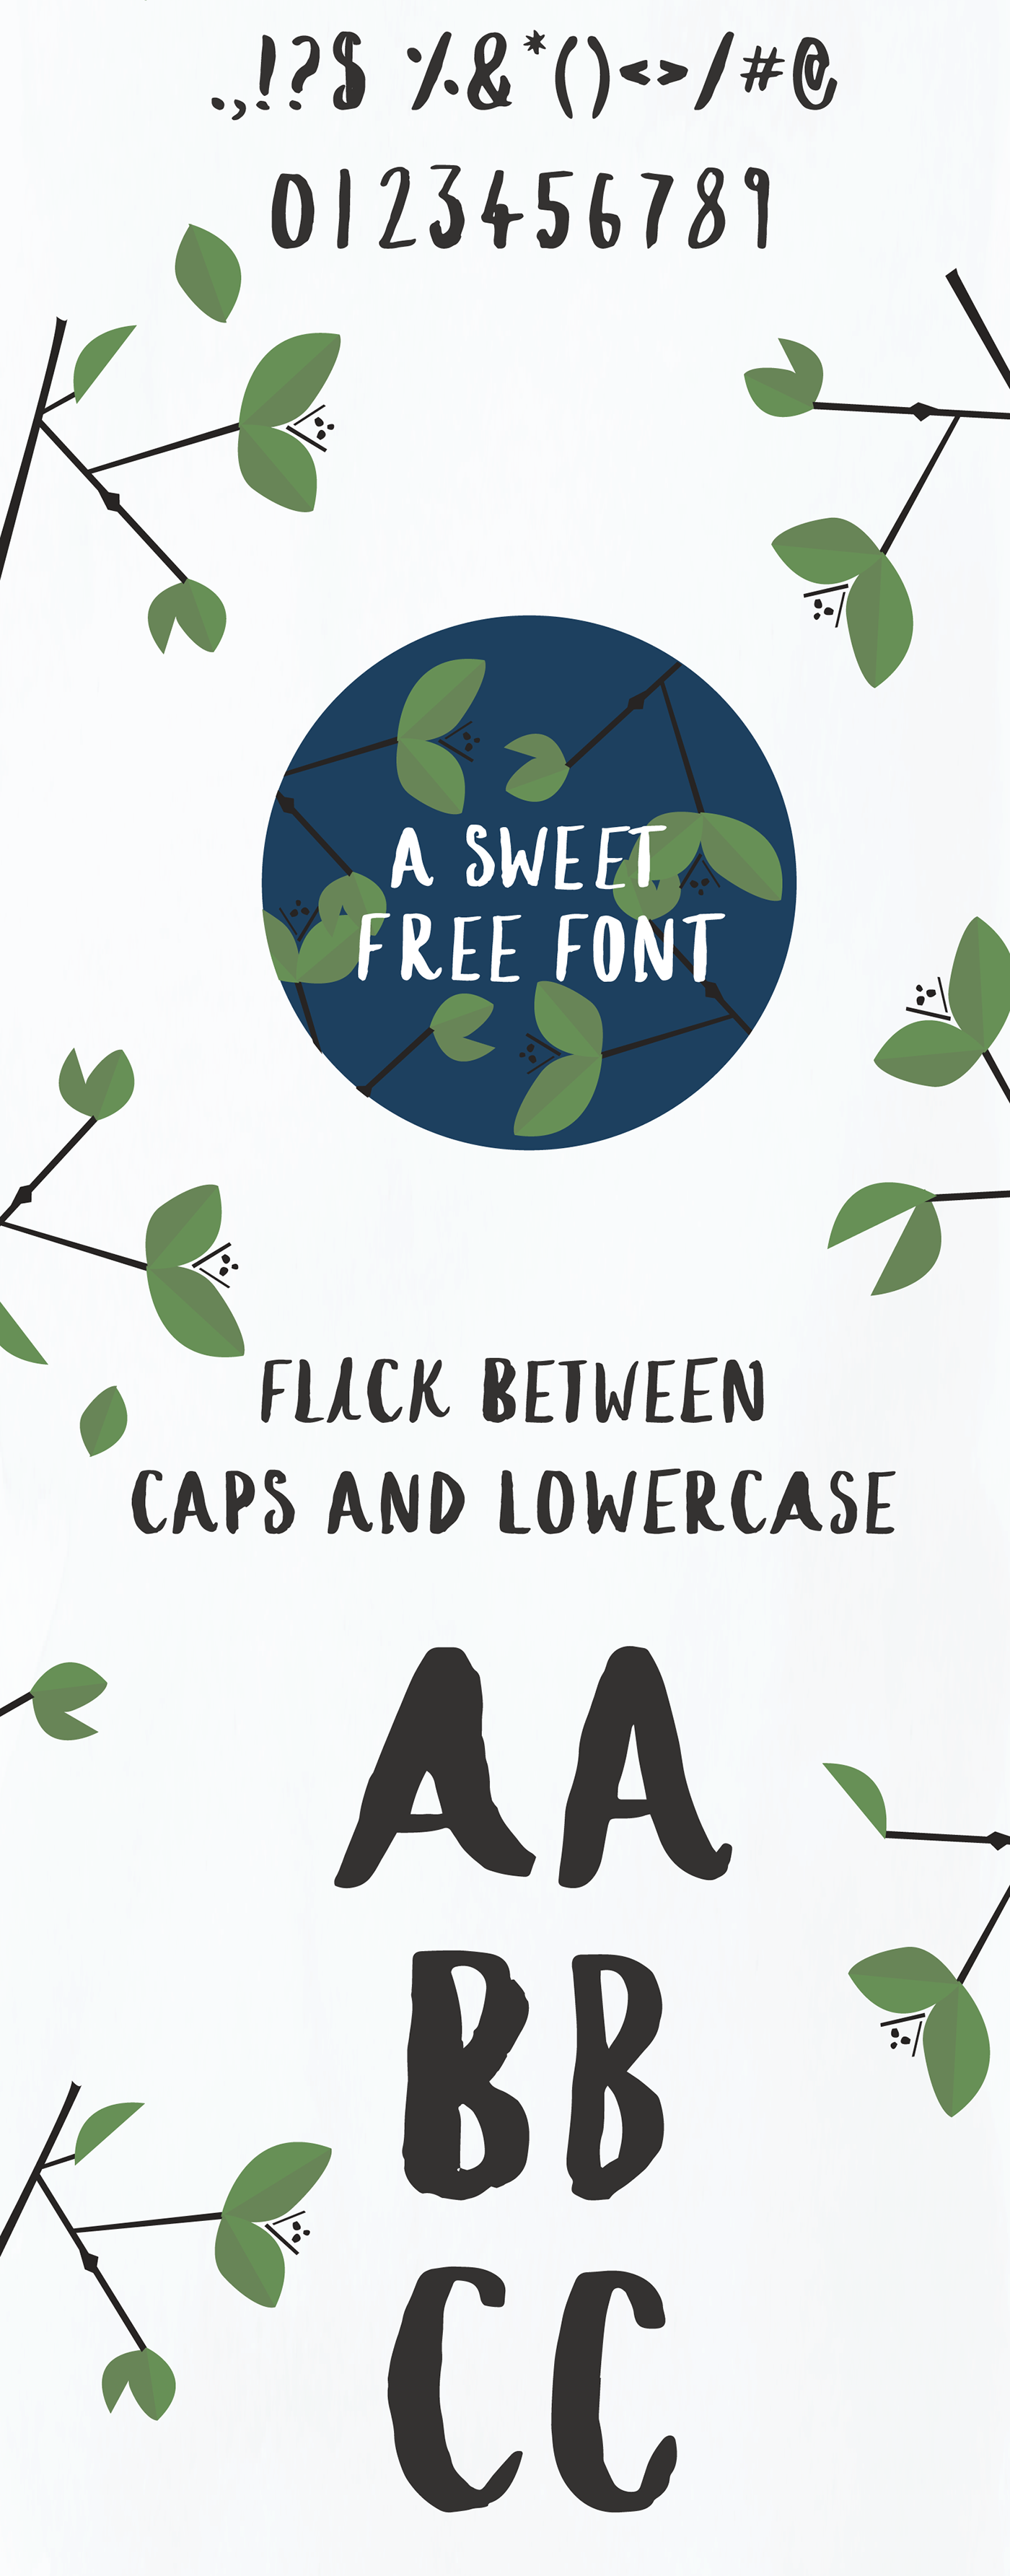 design type font free freefont Typeface lettering download Script Cyrillic